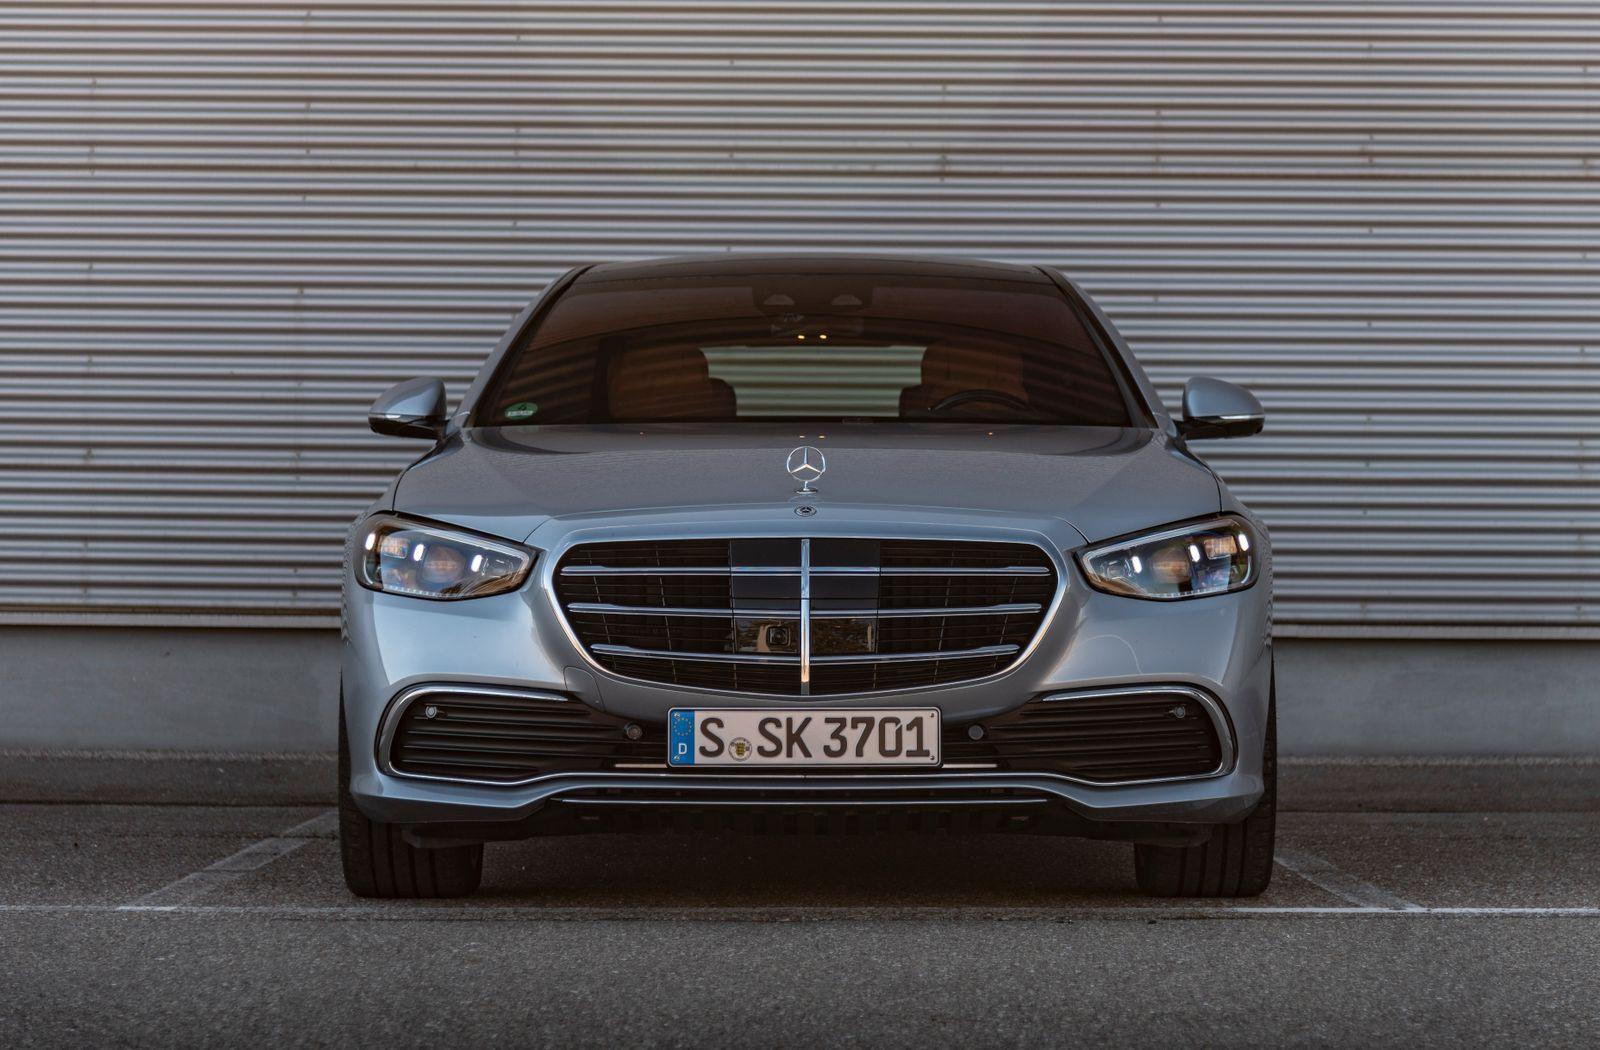 Mercedes-Benz S-Klasse Presse Fahrvorstellung. Immendingen 2020 // Mercedes-Benz S-Class press test drive. Immendingen 2020